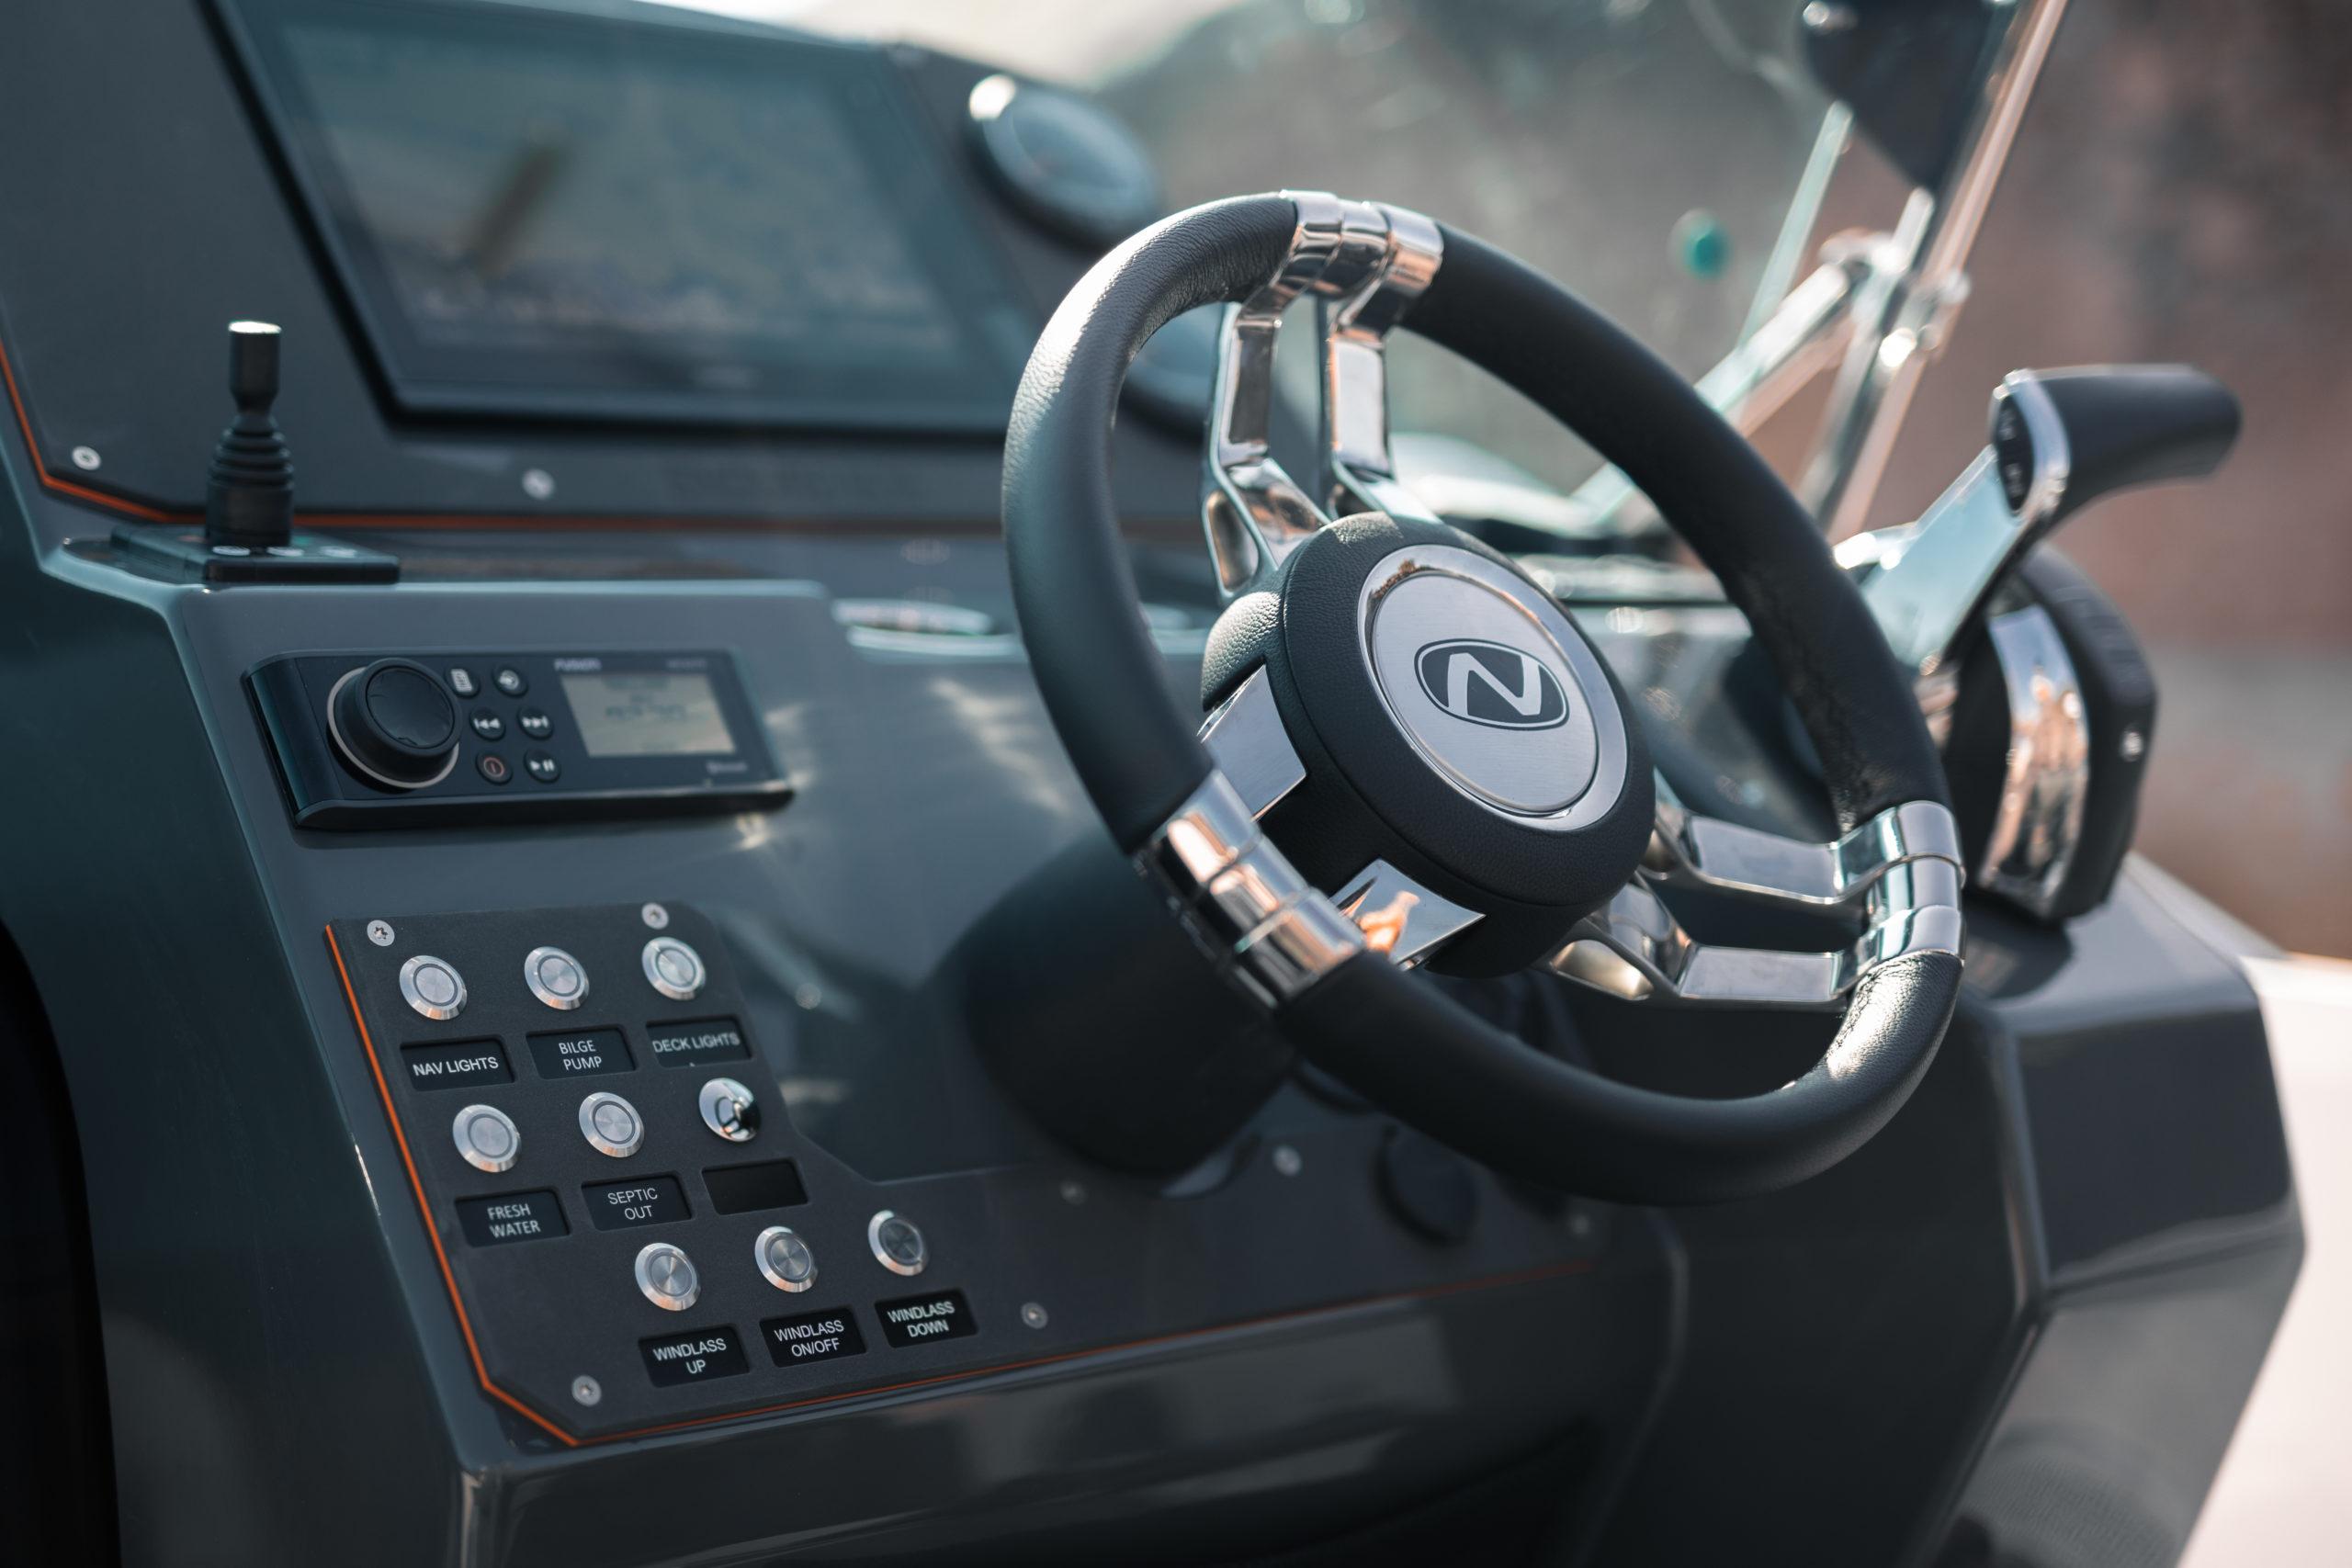 Enduro 805 details - cockpit dashboard